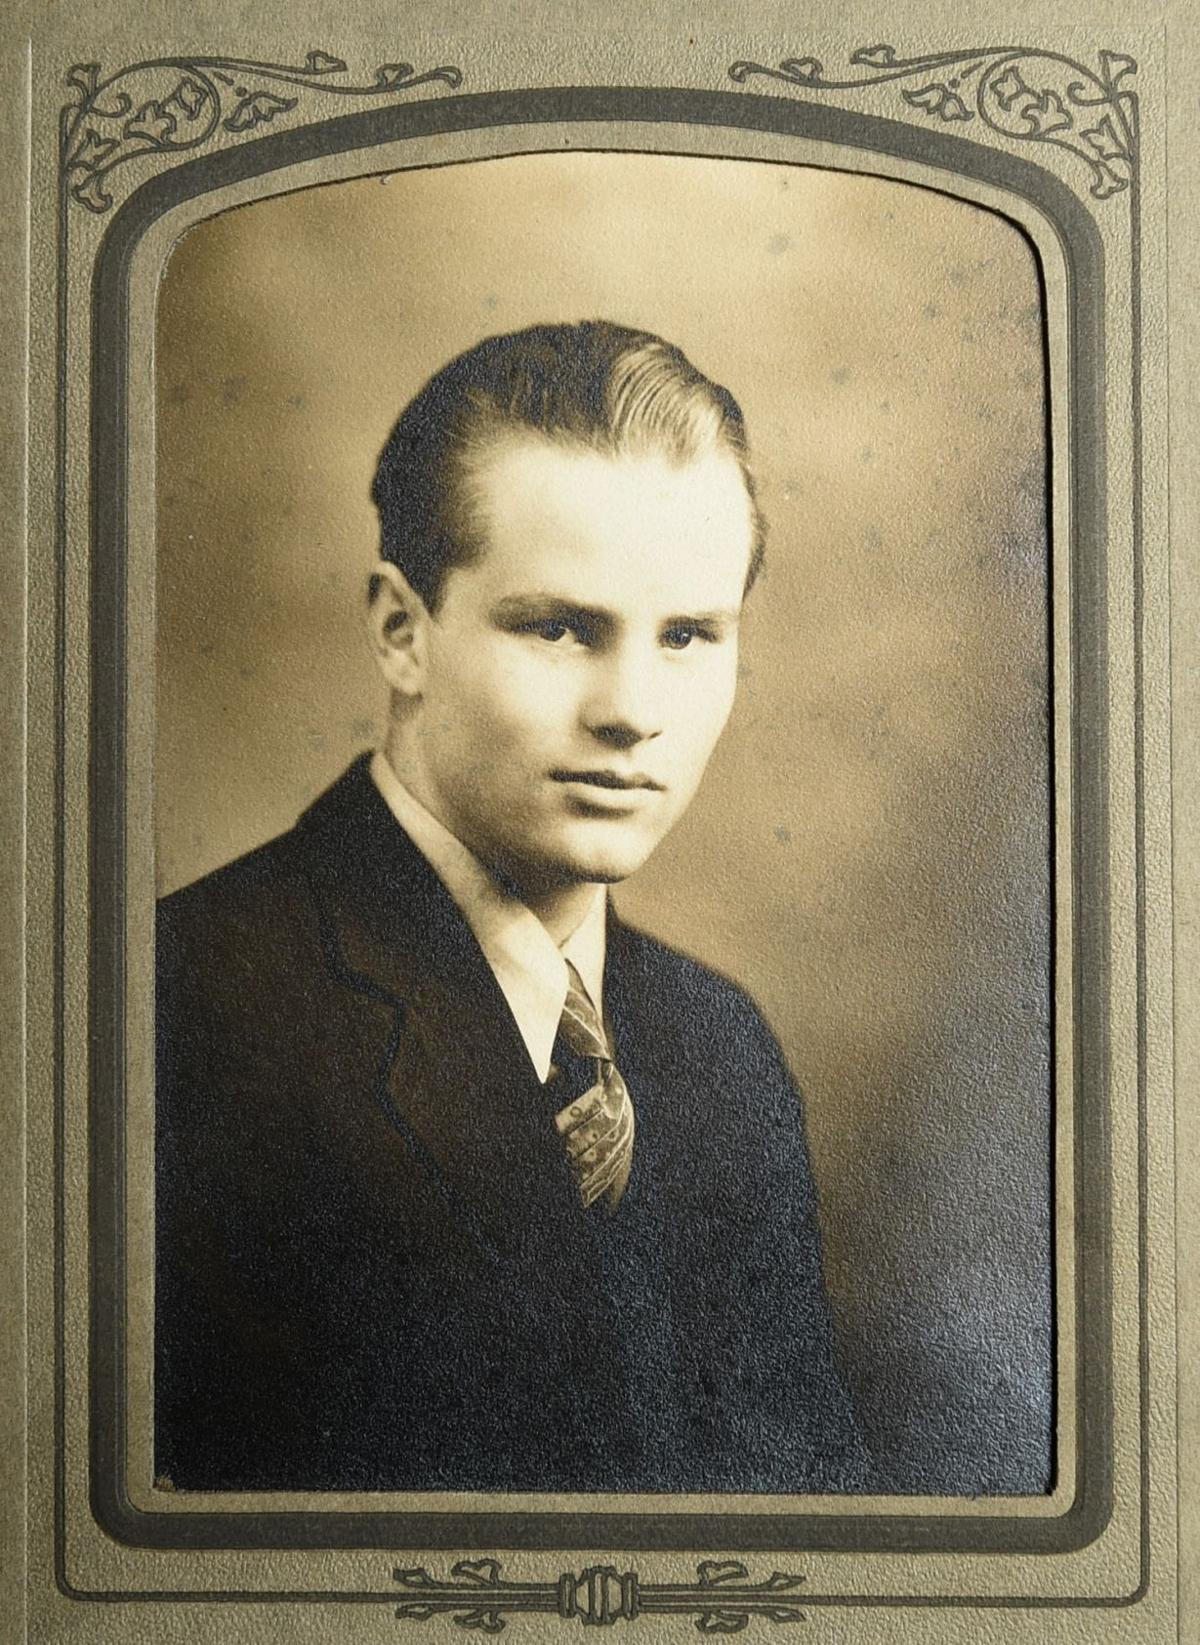 Harold Logan graduation picture